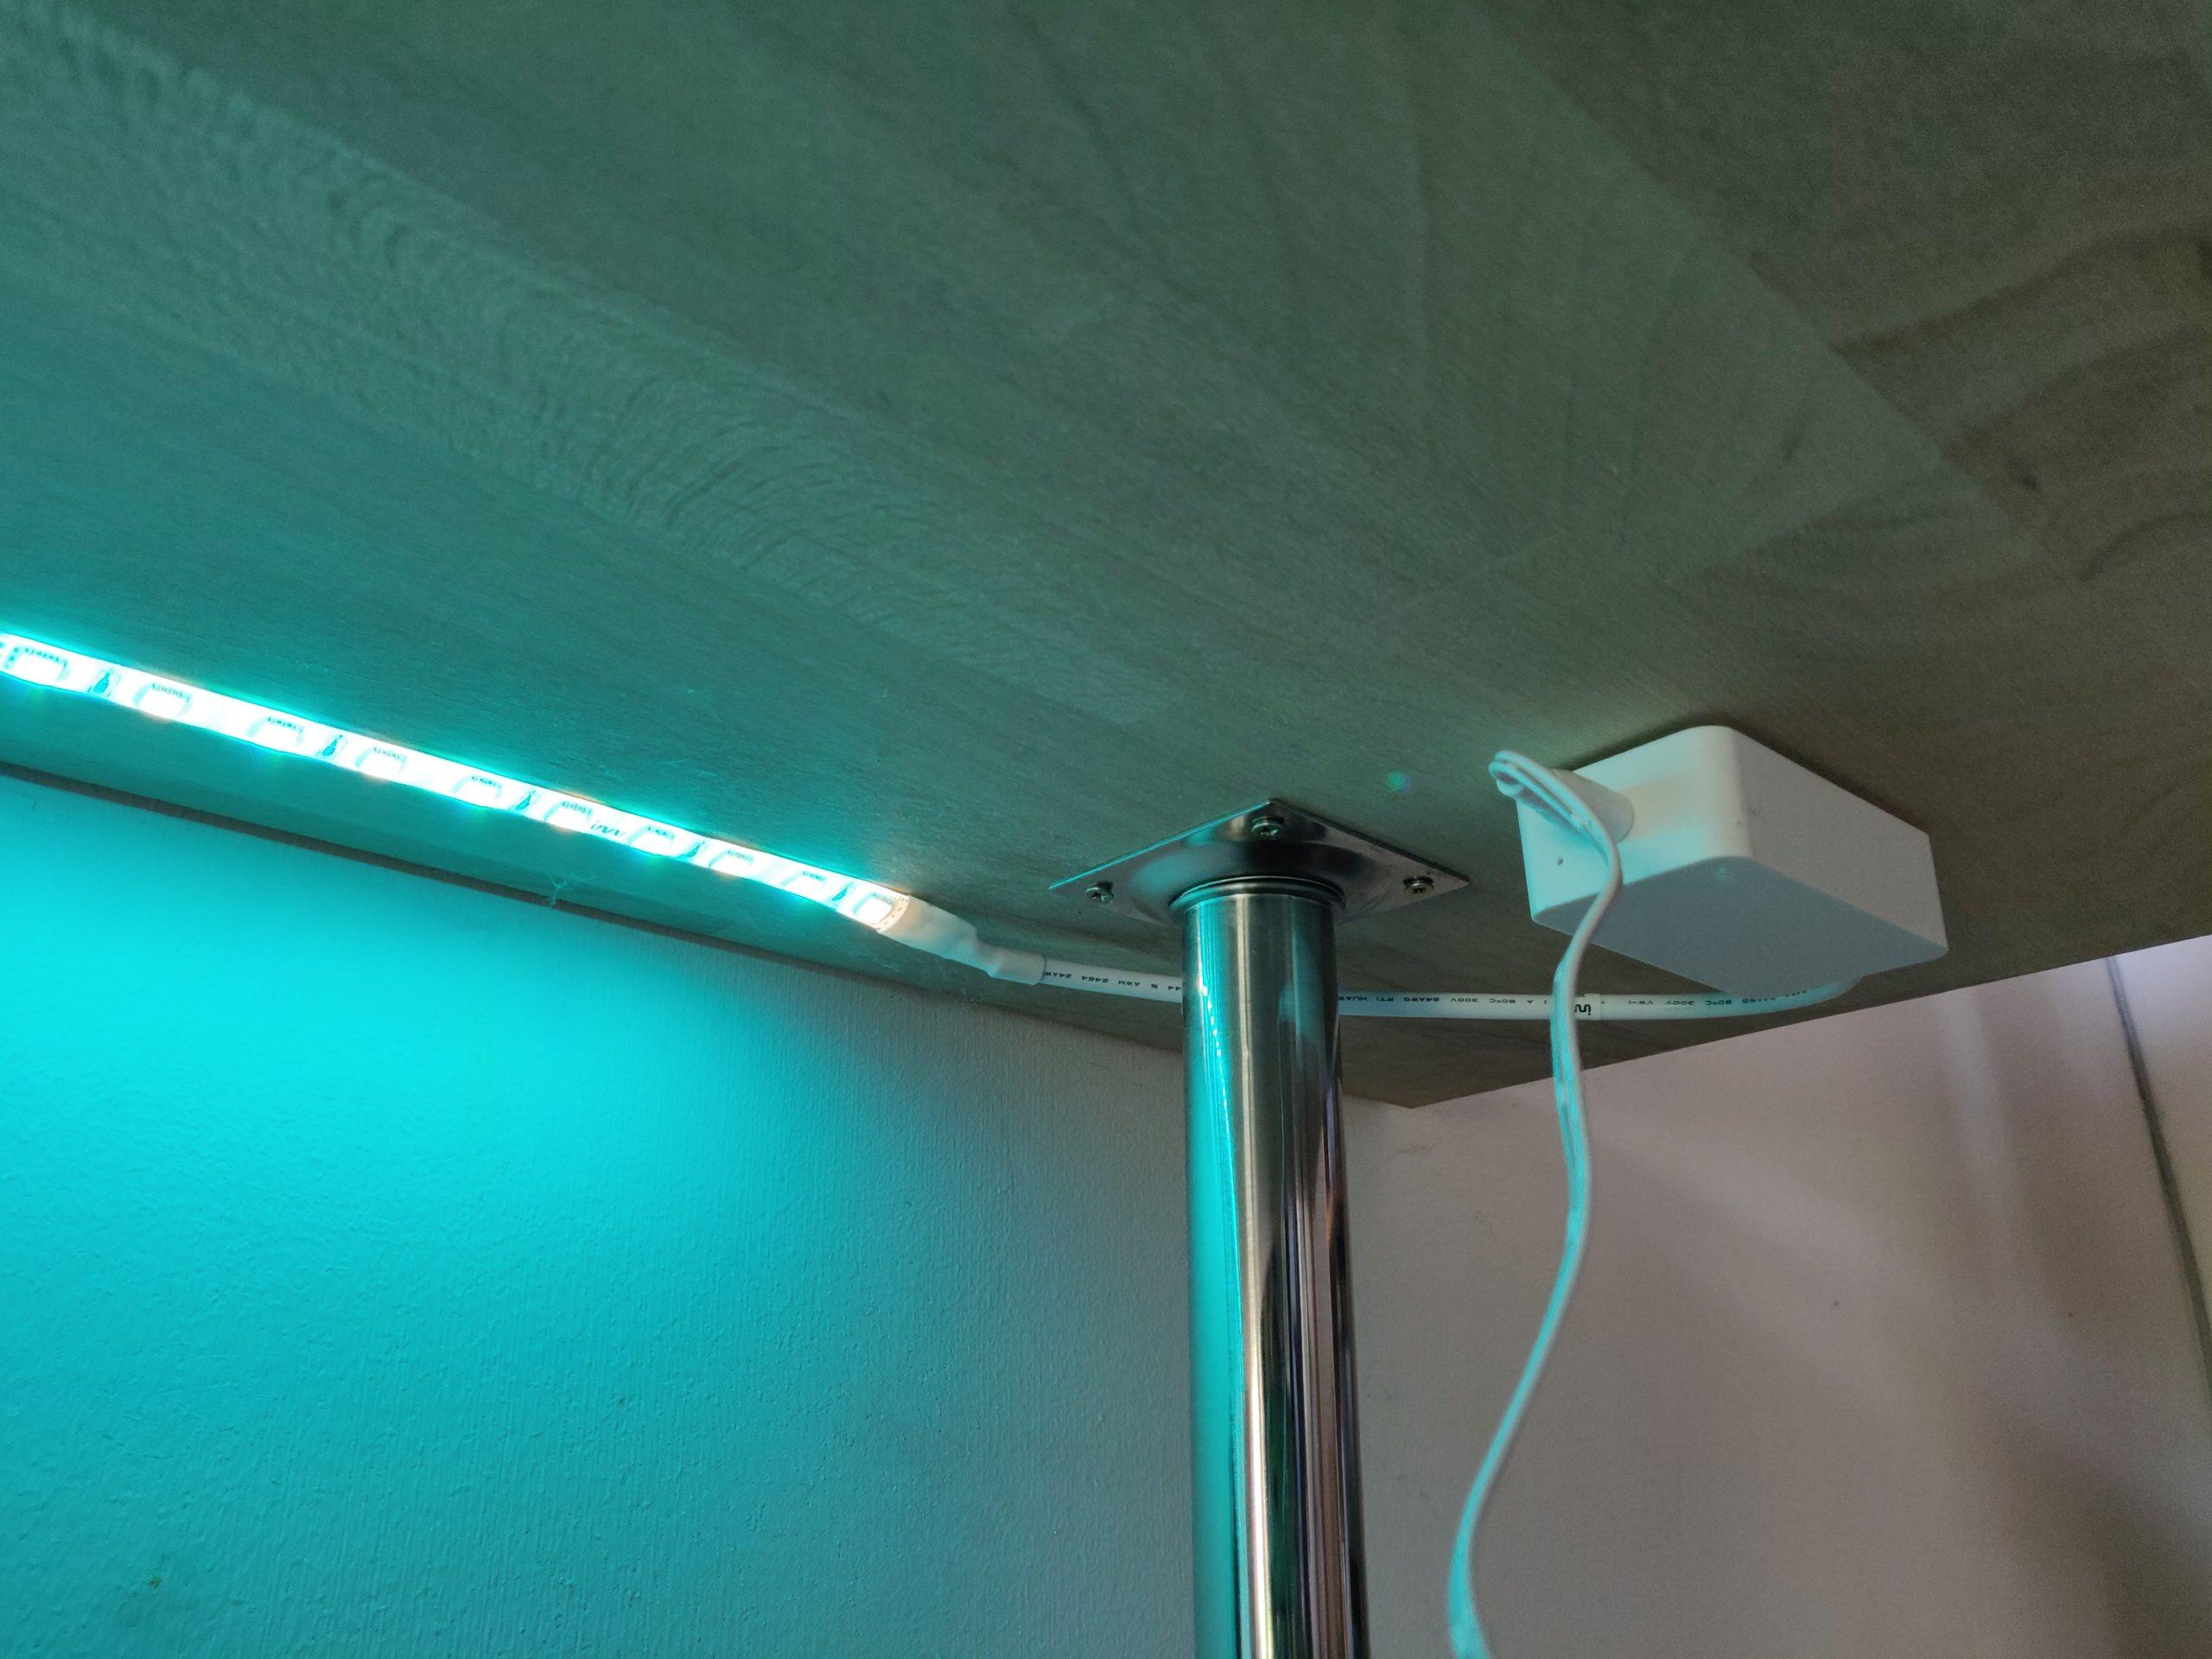 Bande LED Innr installation